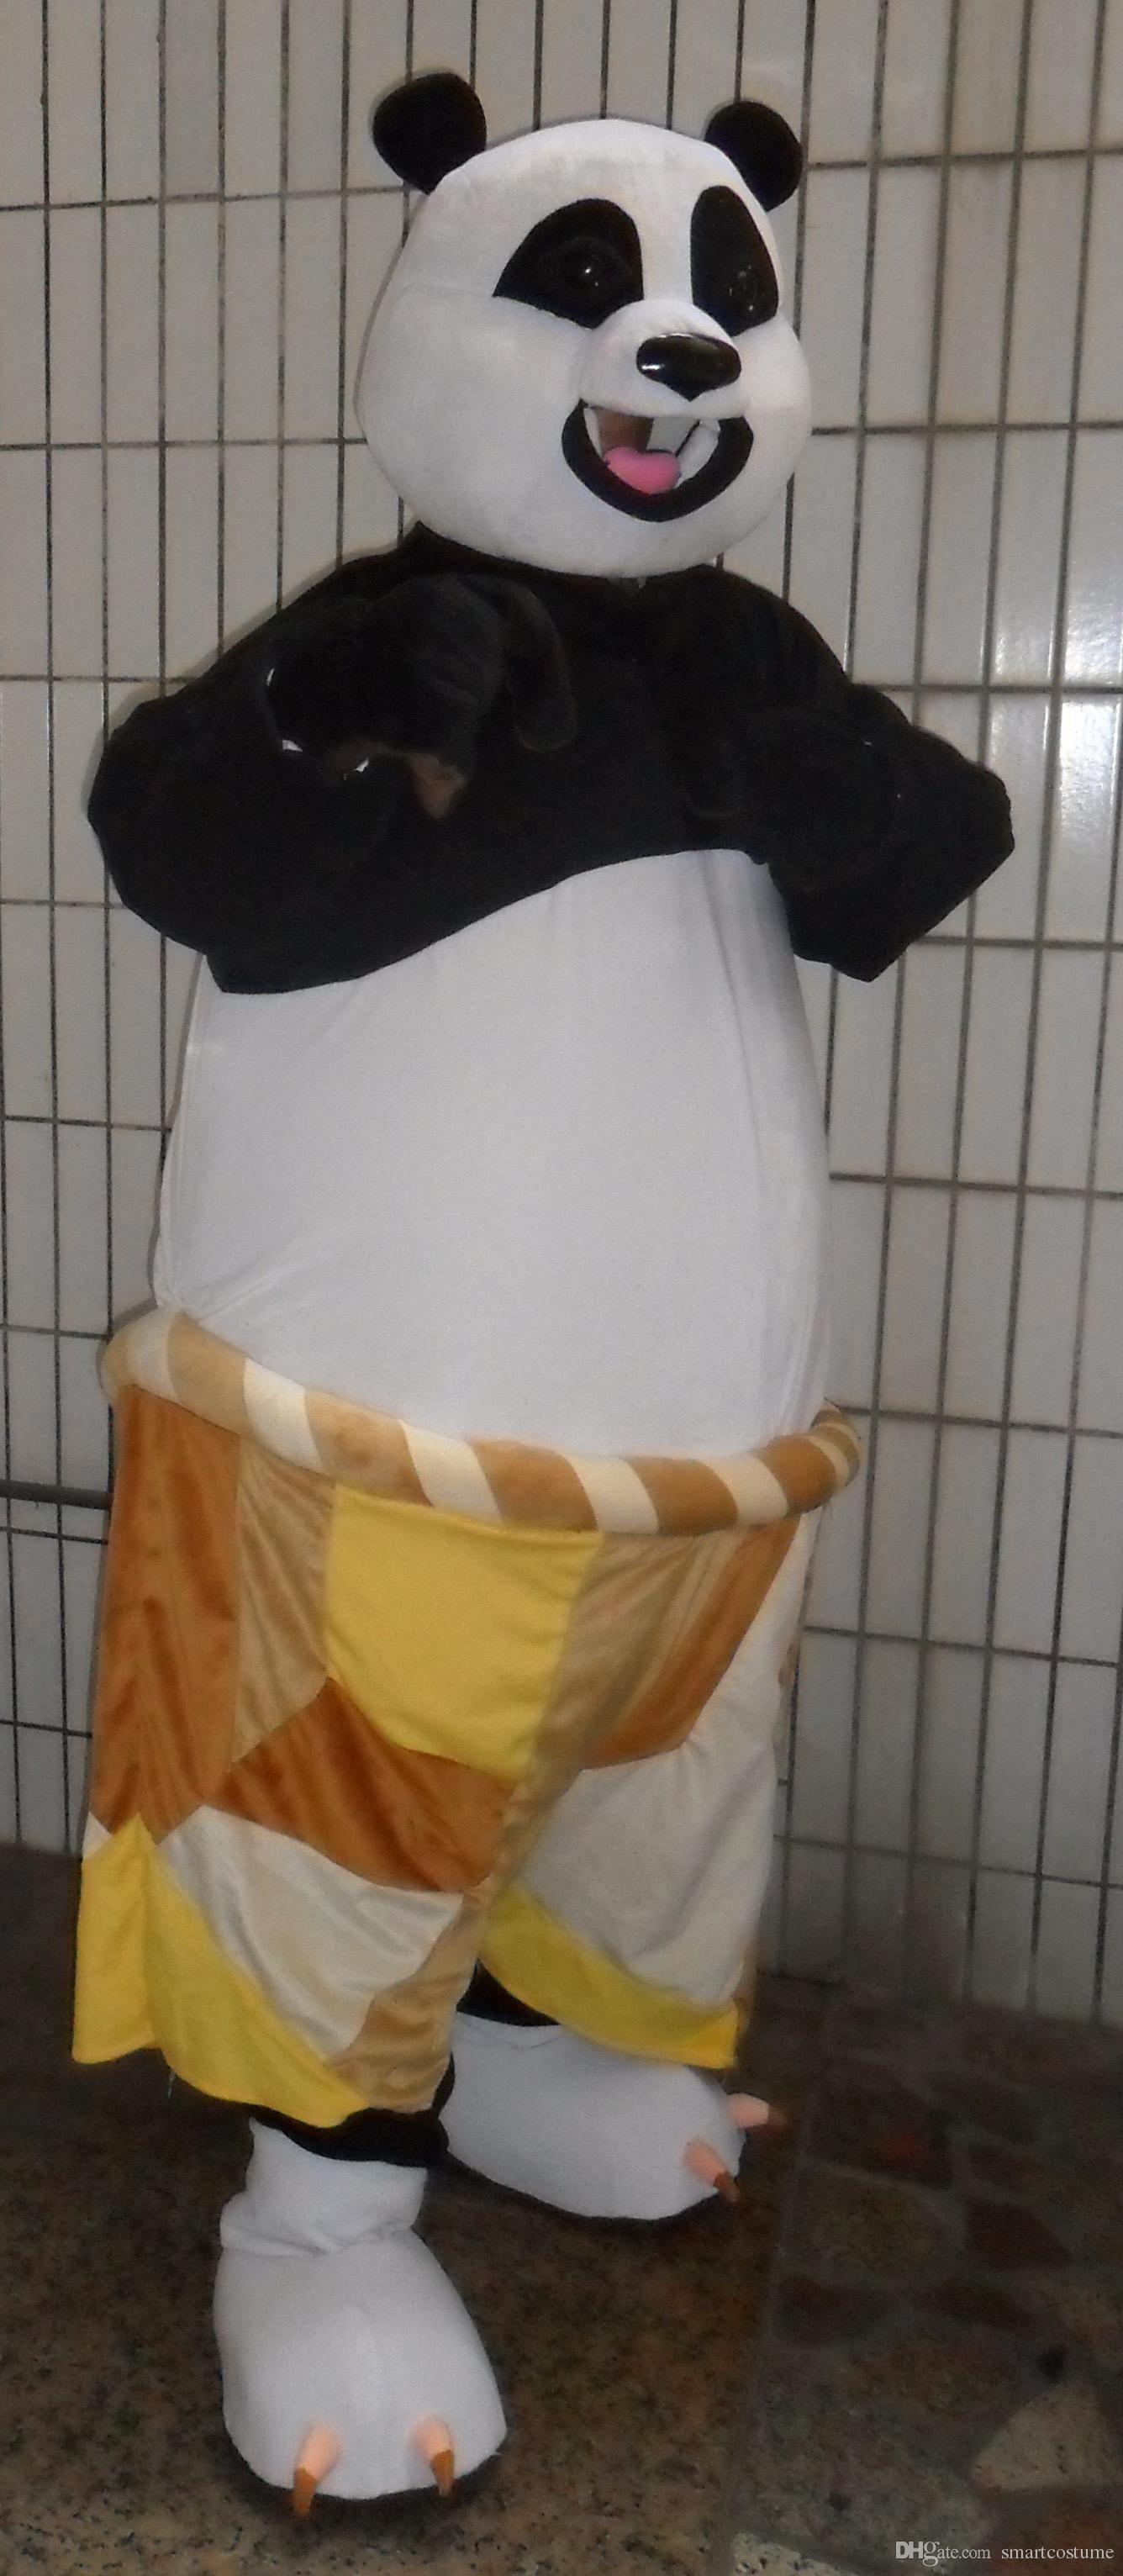 rh0415 kung fu panda halloween costume an adult kung fu panda mascot costume for adult to wear panda mascot costume kung fu panda halloween costume panda - Kung Fu Panda Halloween